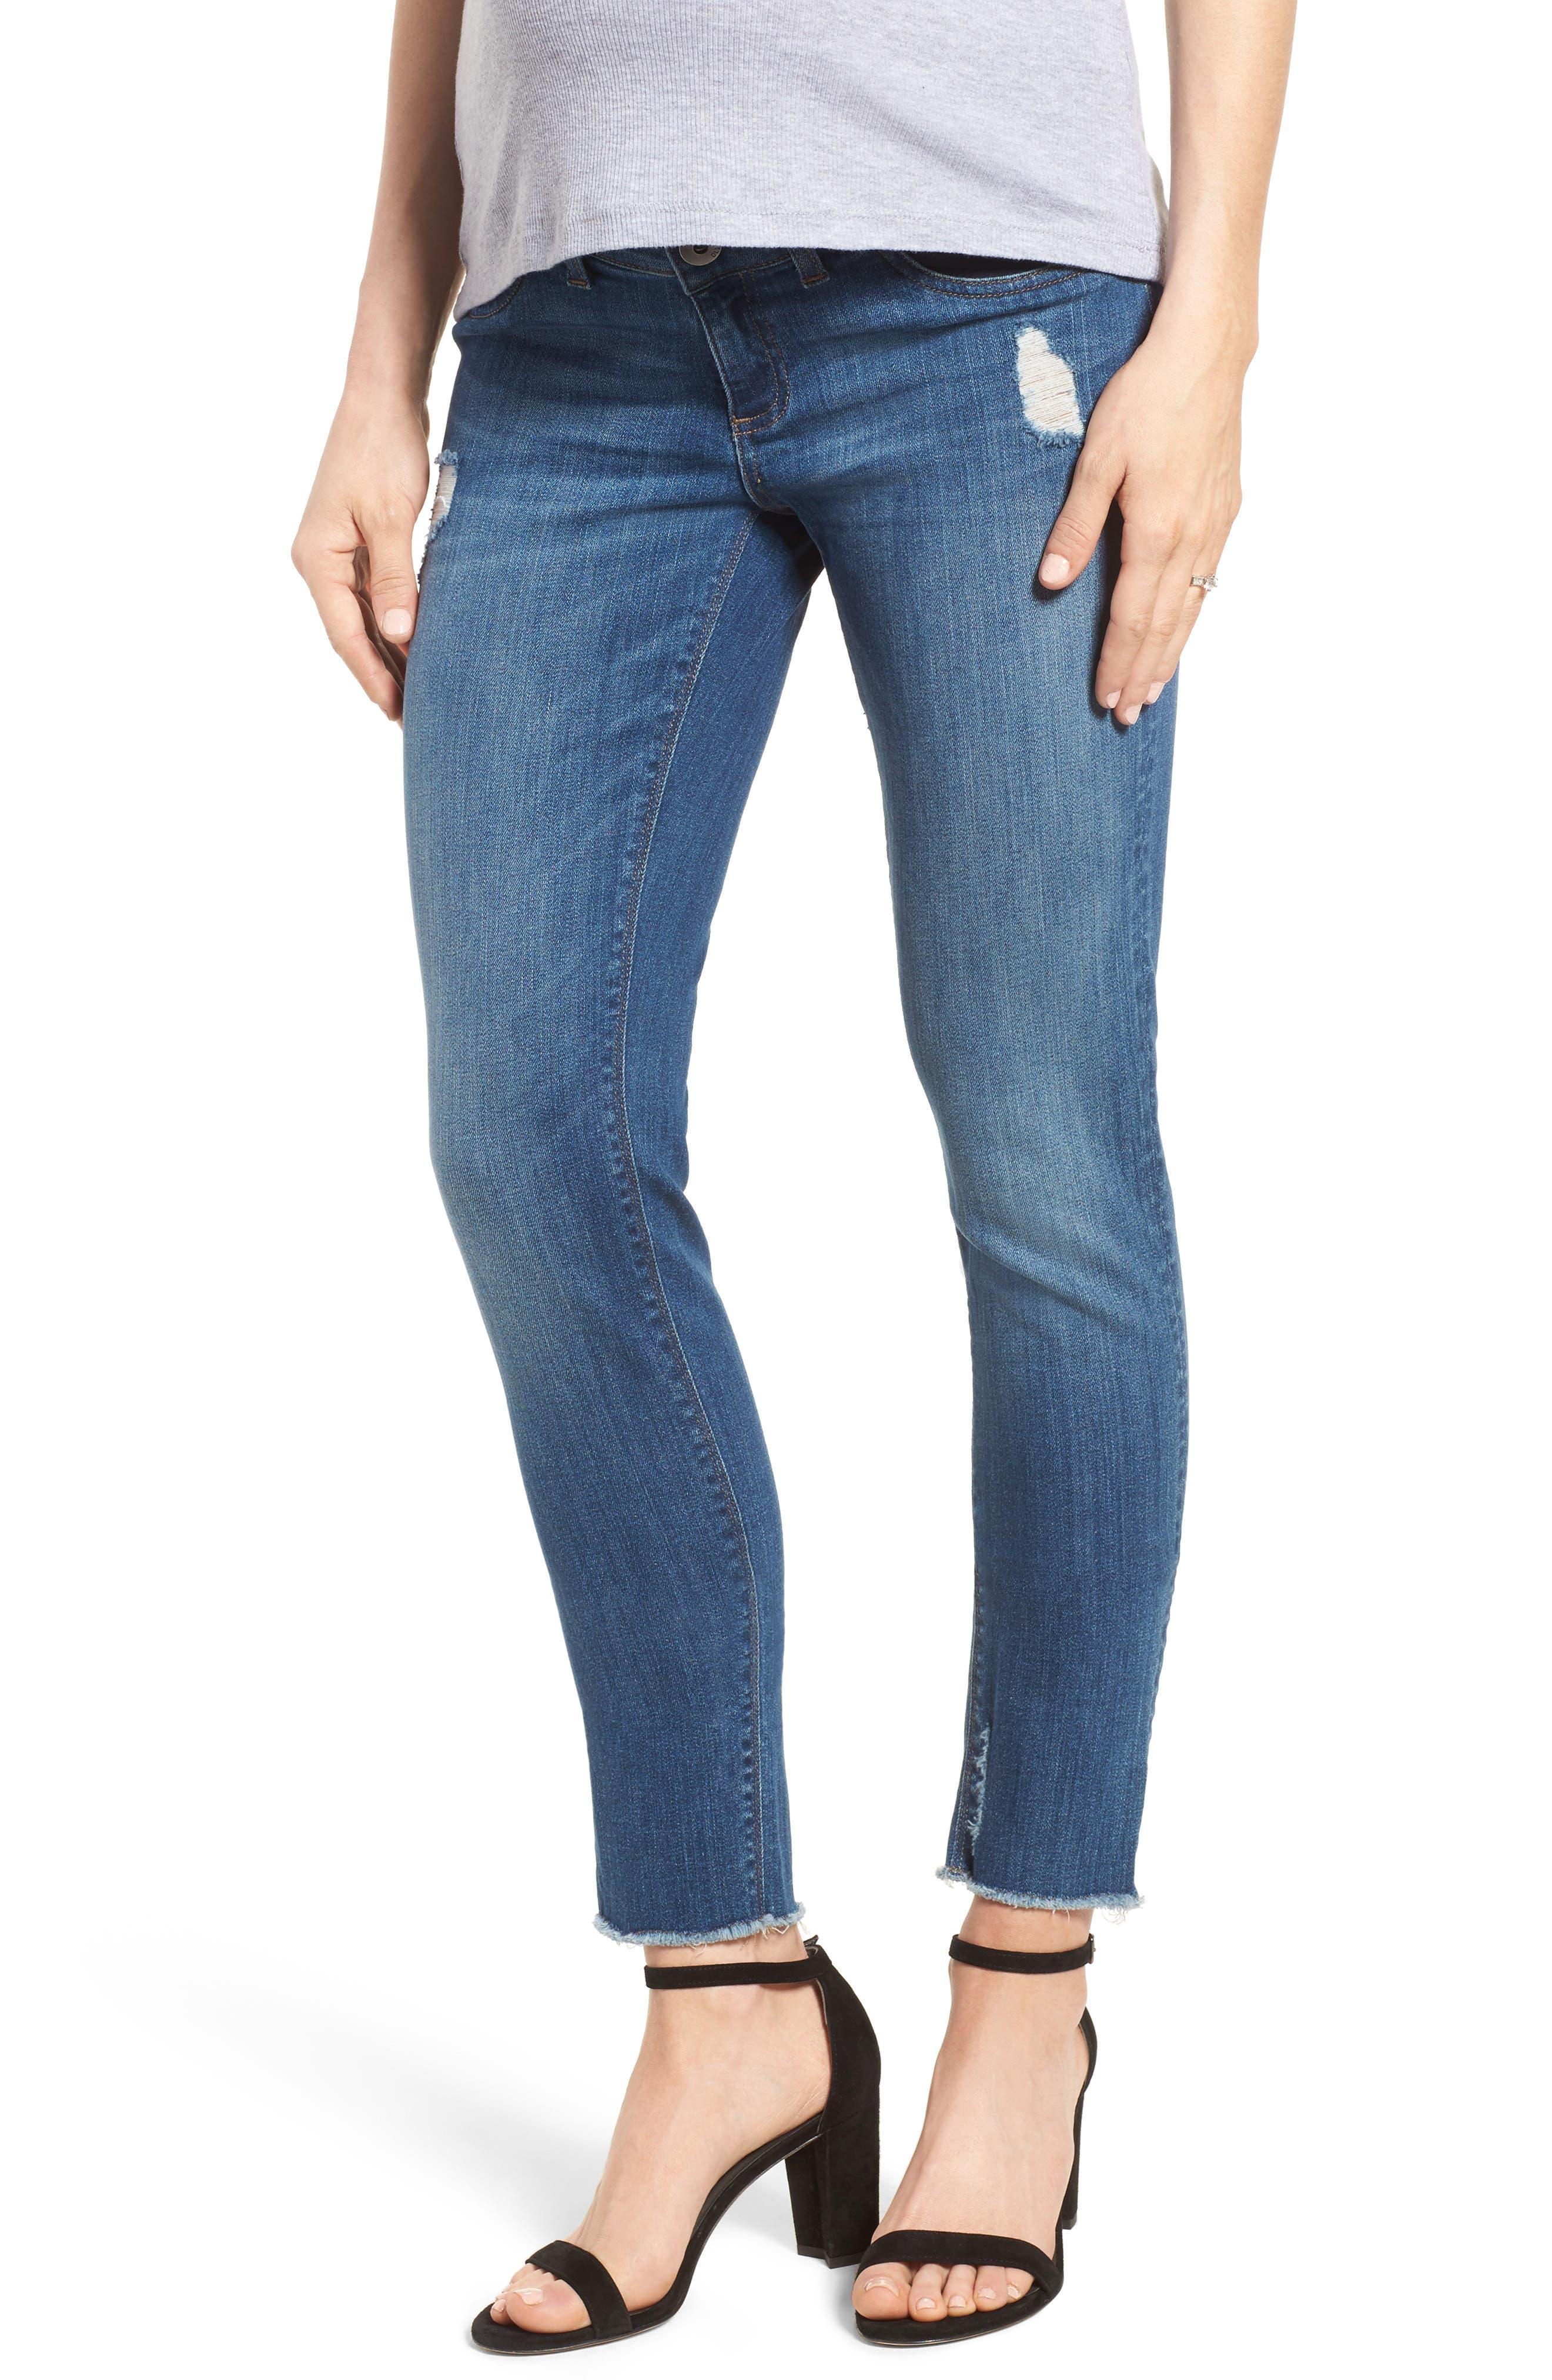 Emma Power Legging Maternity Jeans,                         Main,                         color, Strobe